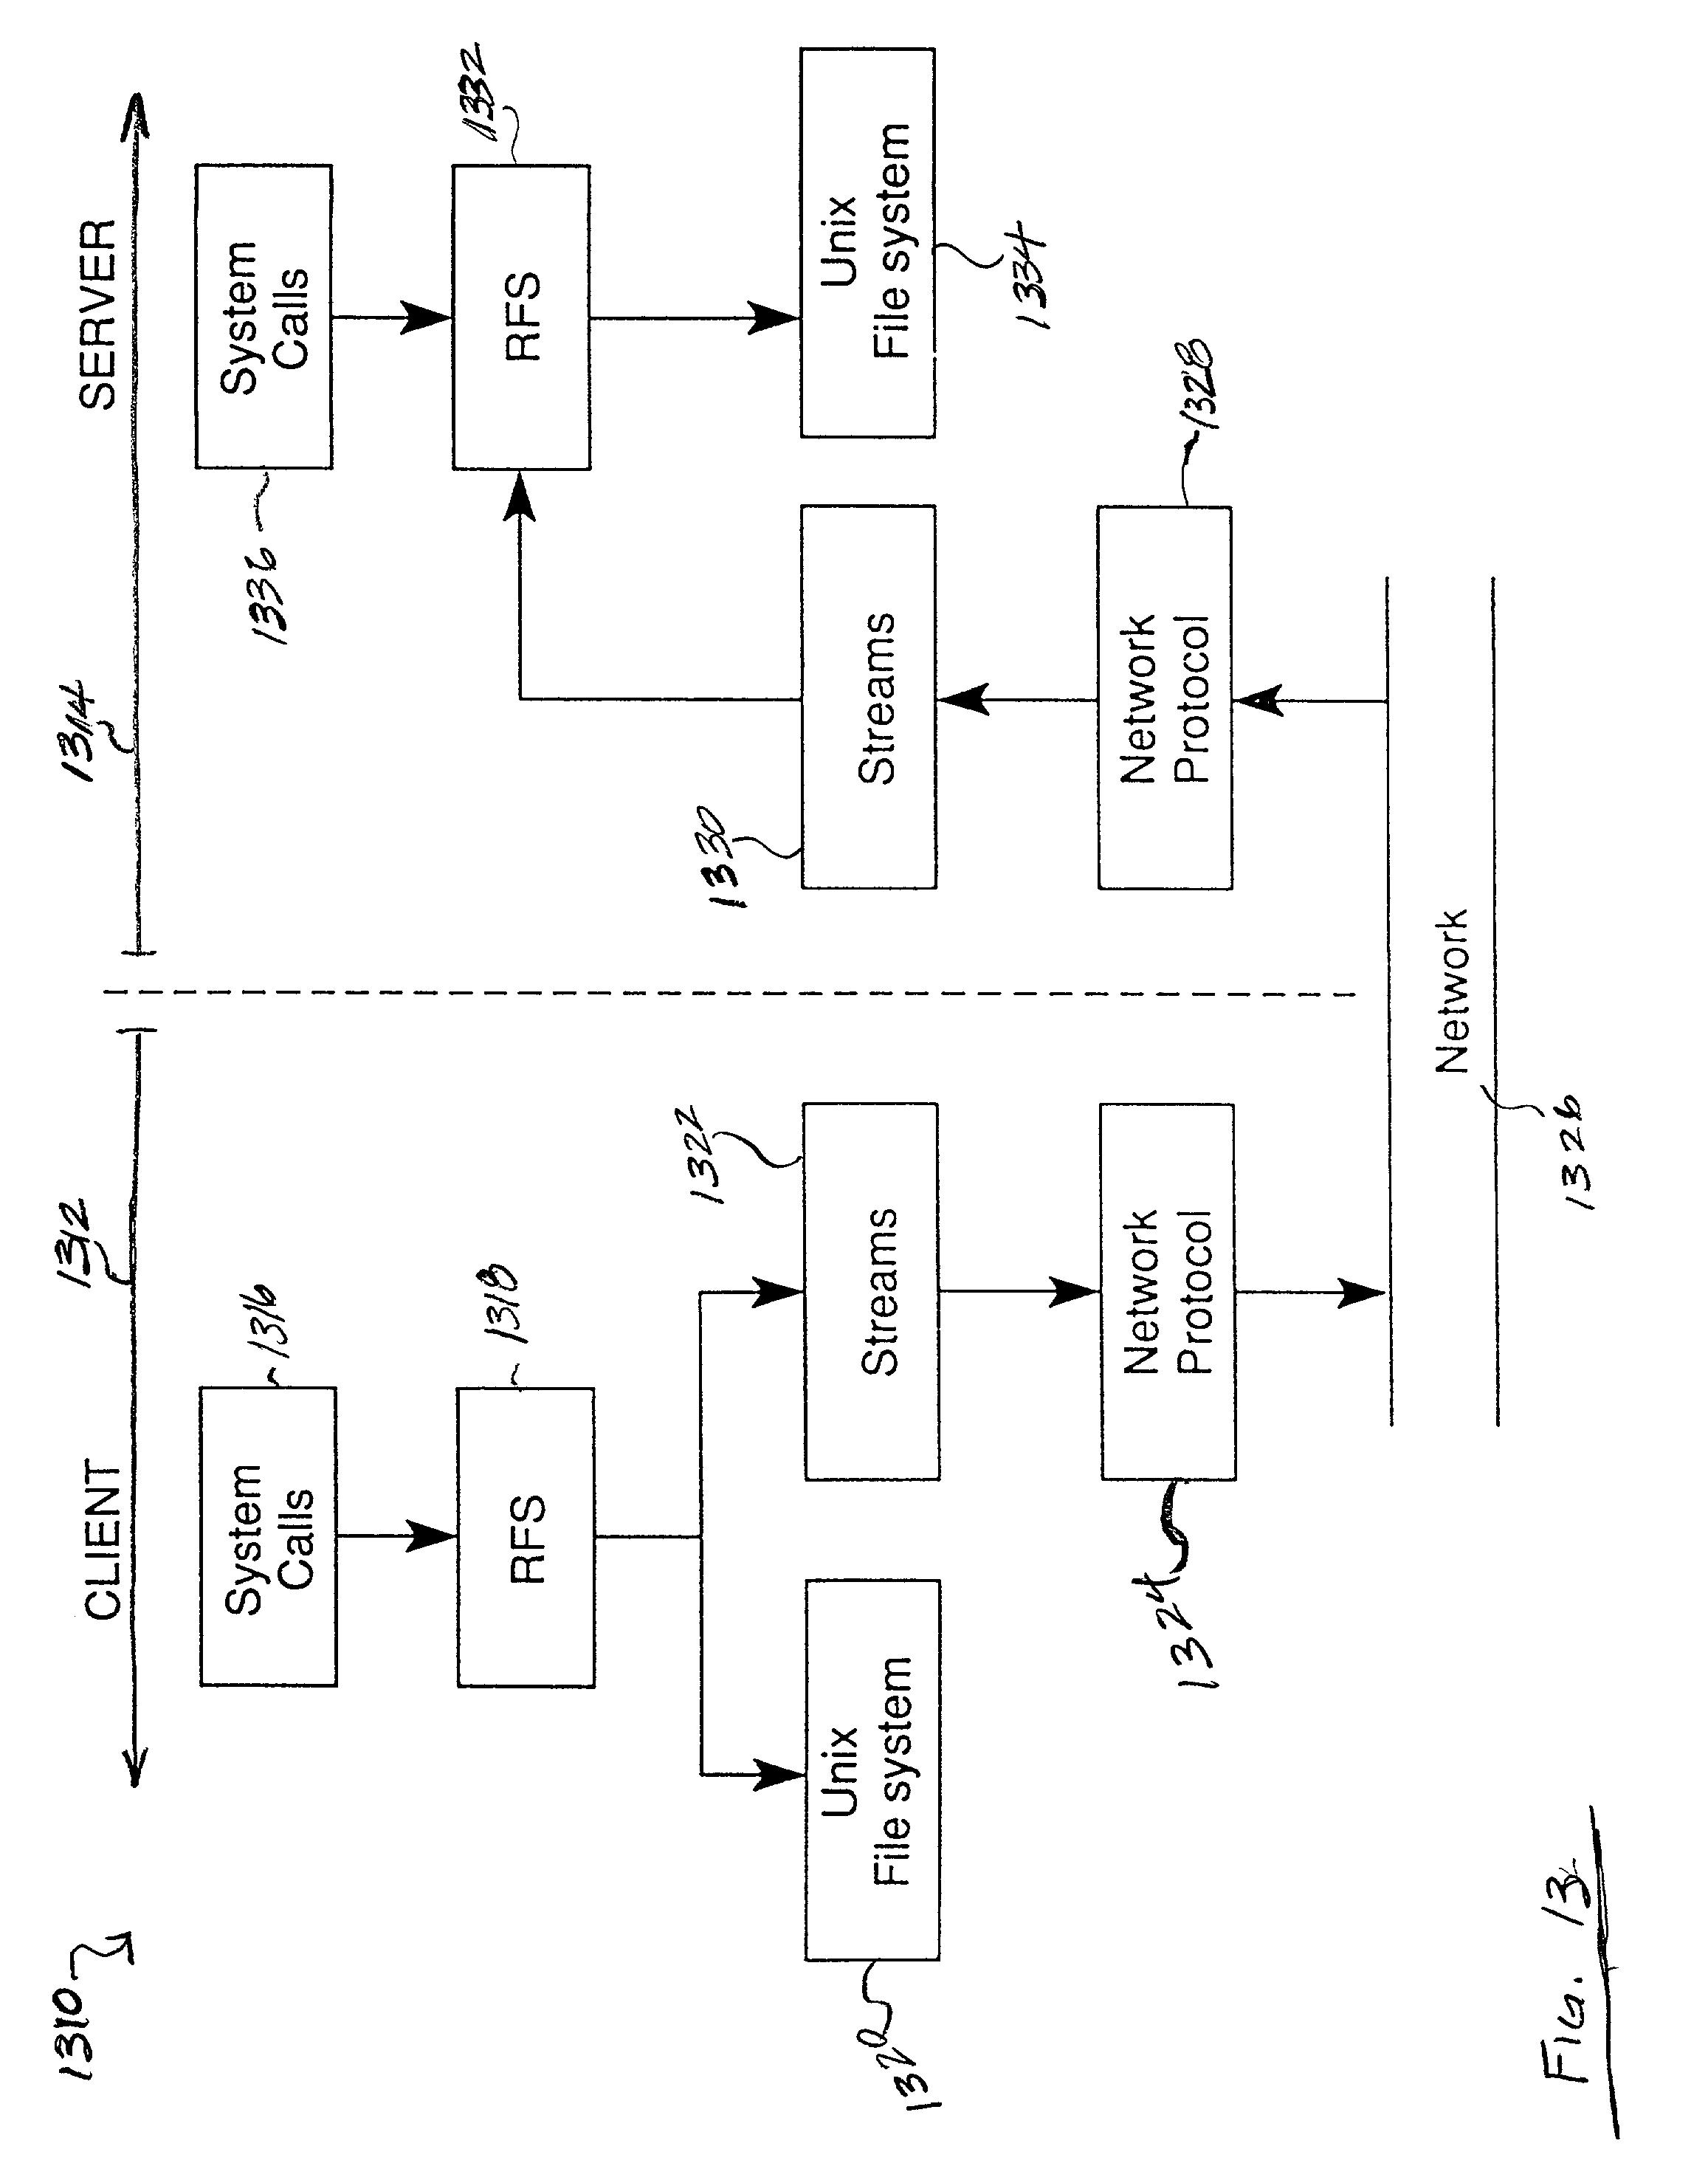 Patent US 20030051026A1